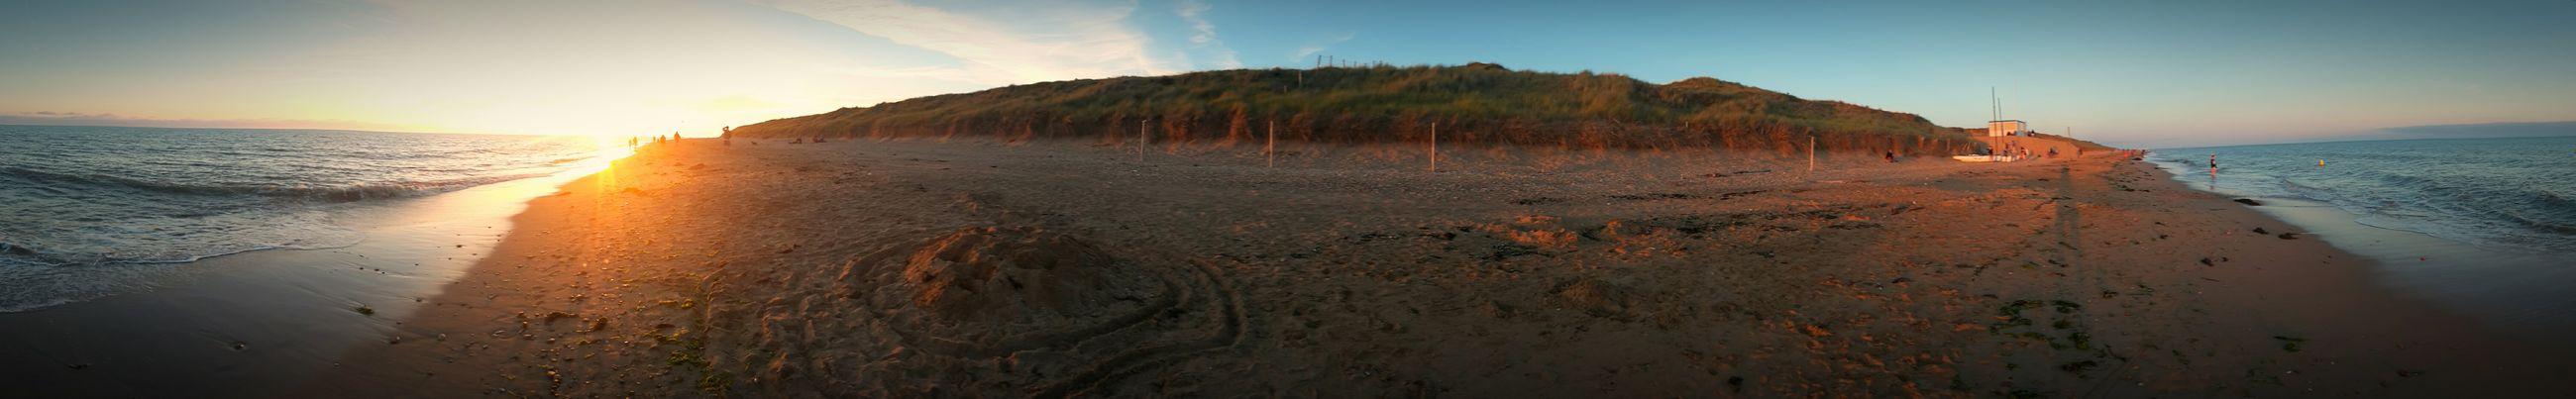 Sunset Panorama Samsungphotography Beach Sea Vacation Samsung